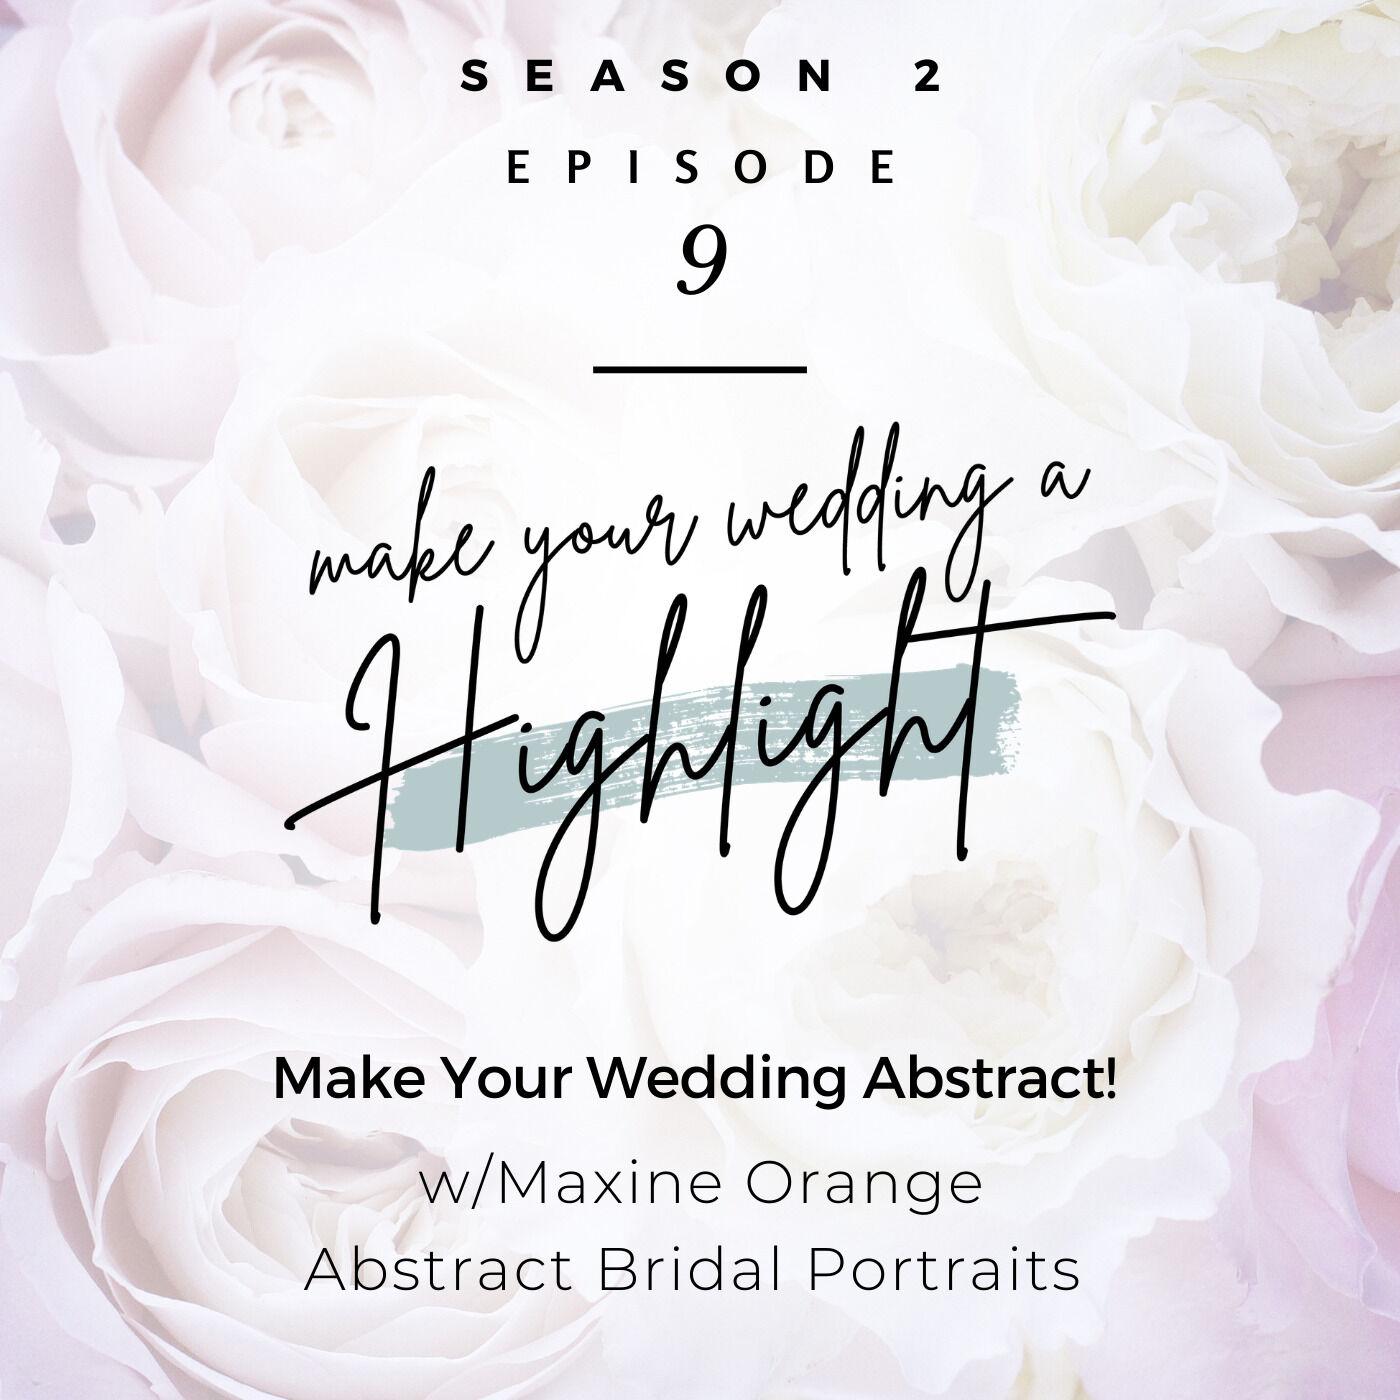 Make Your Wedding Abstract!